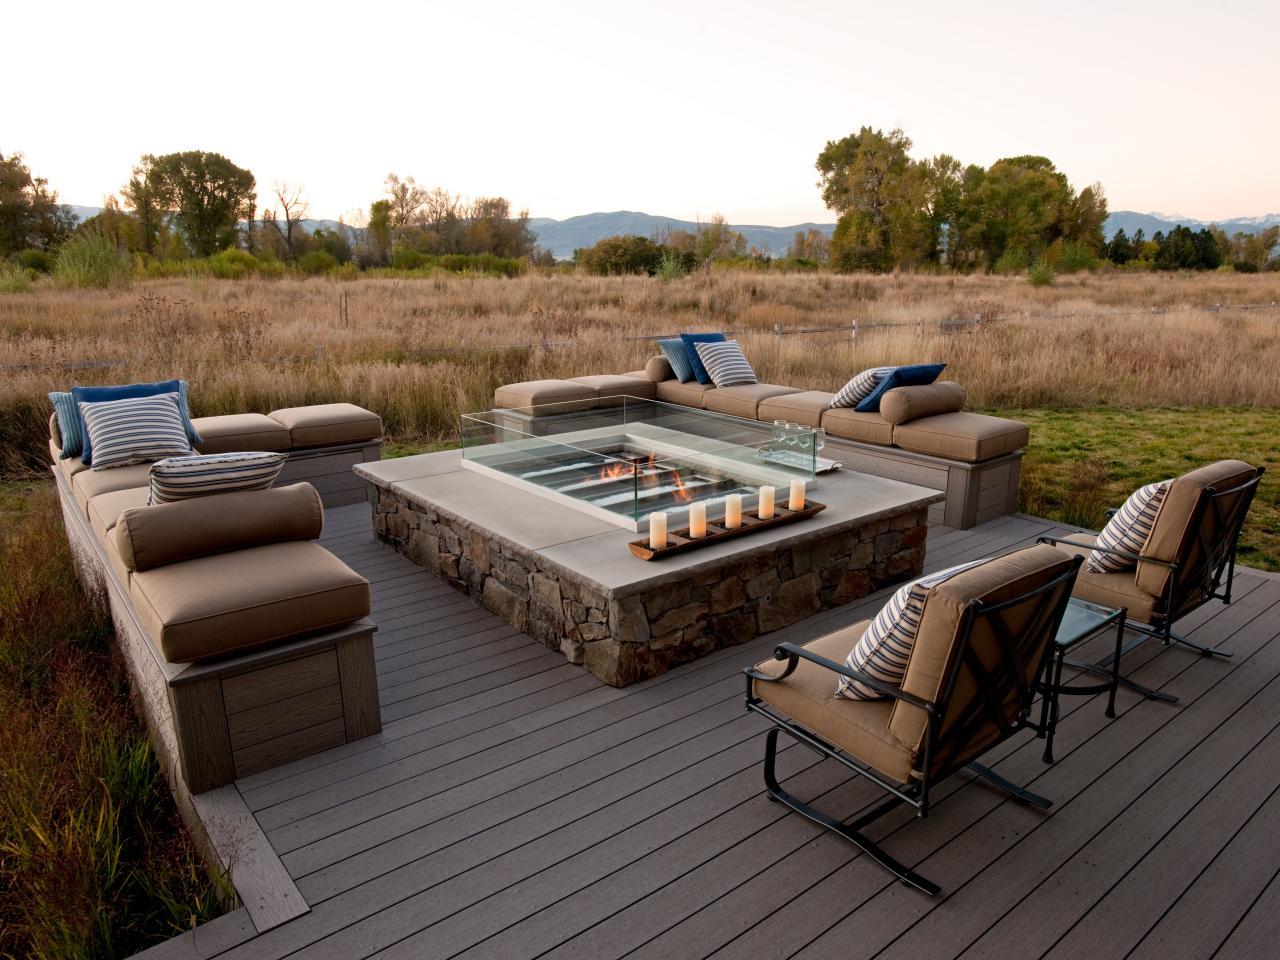 Decks With Gas Fire Pit Decks Ideas inside size 1280 X 960